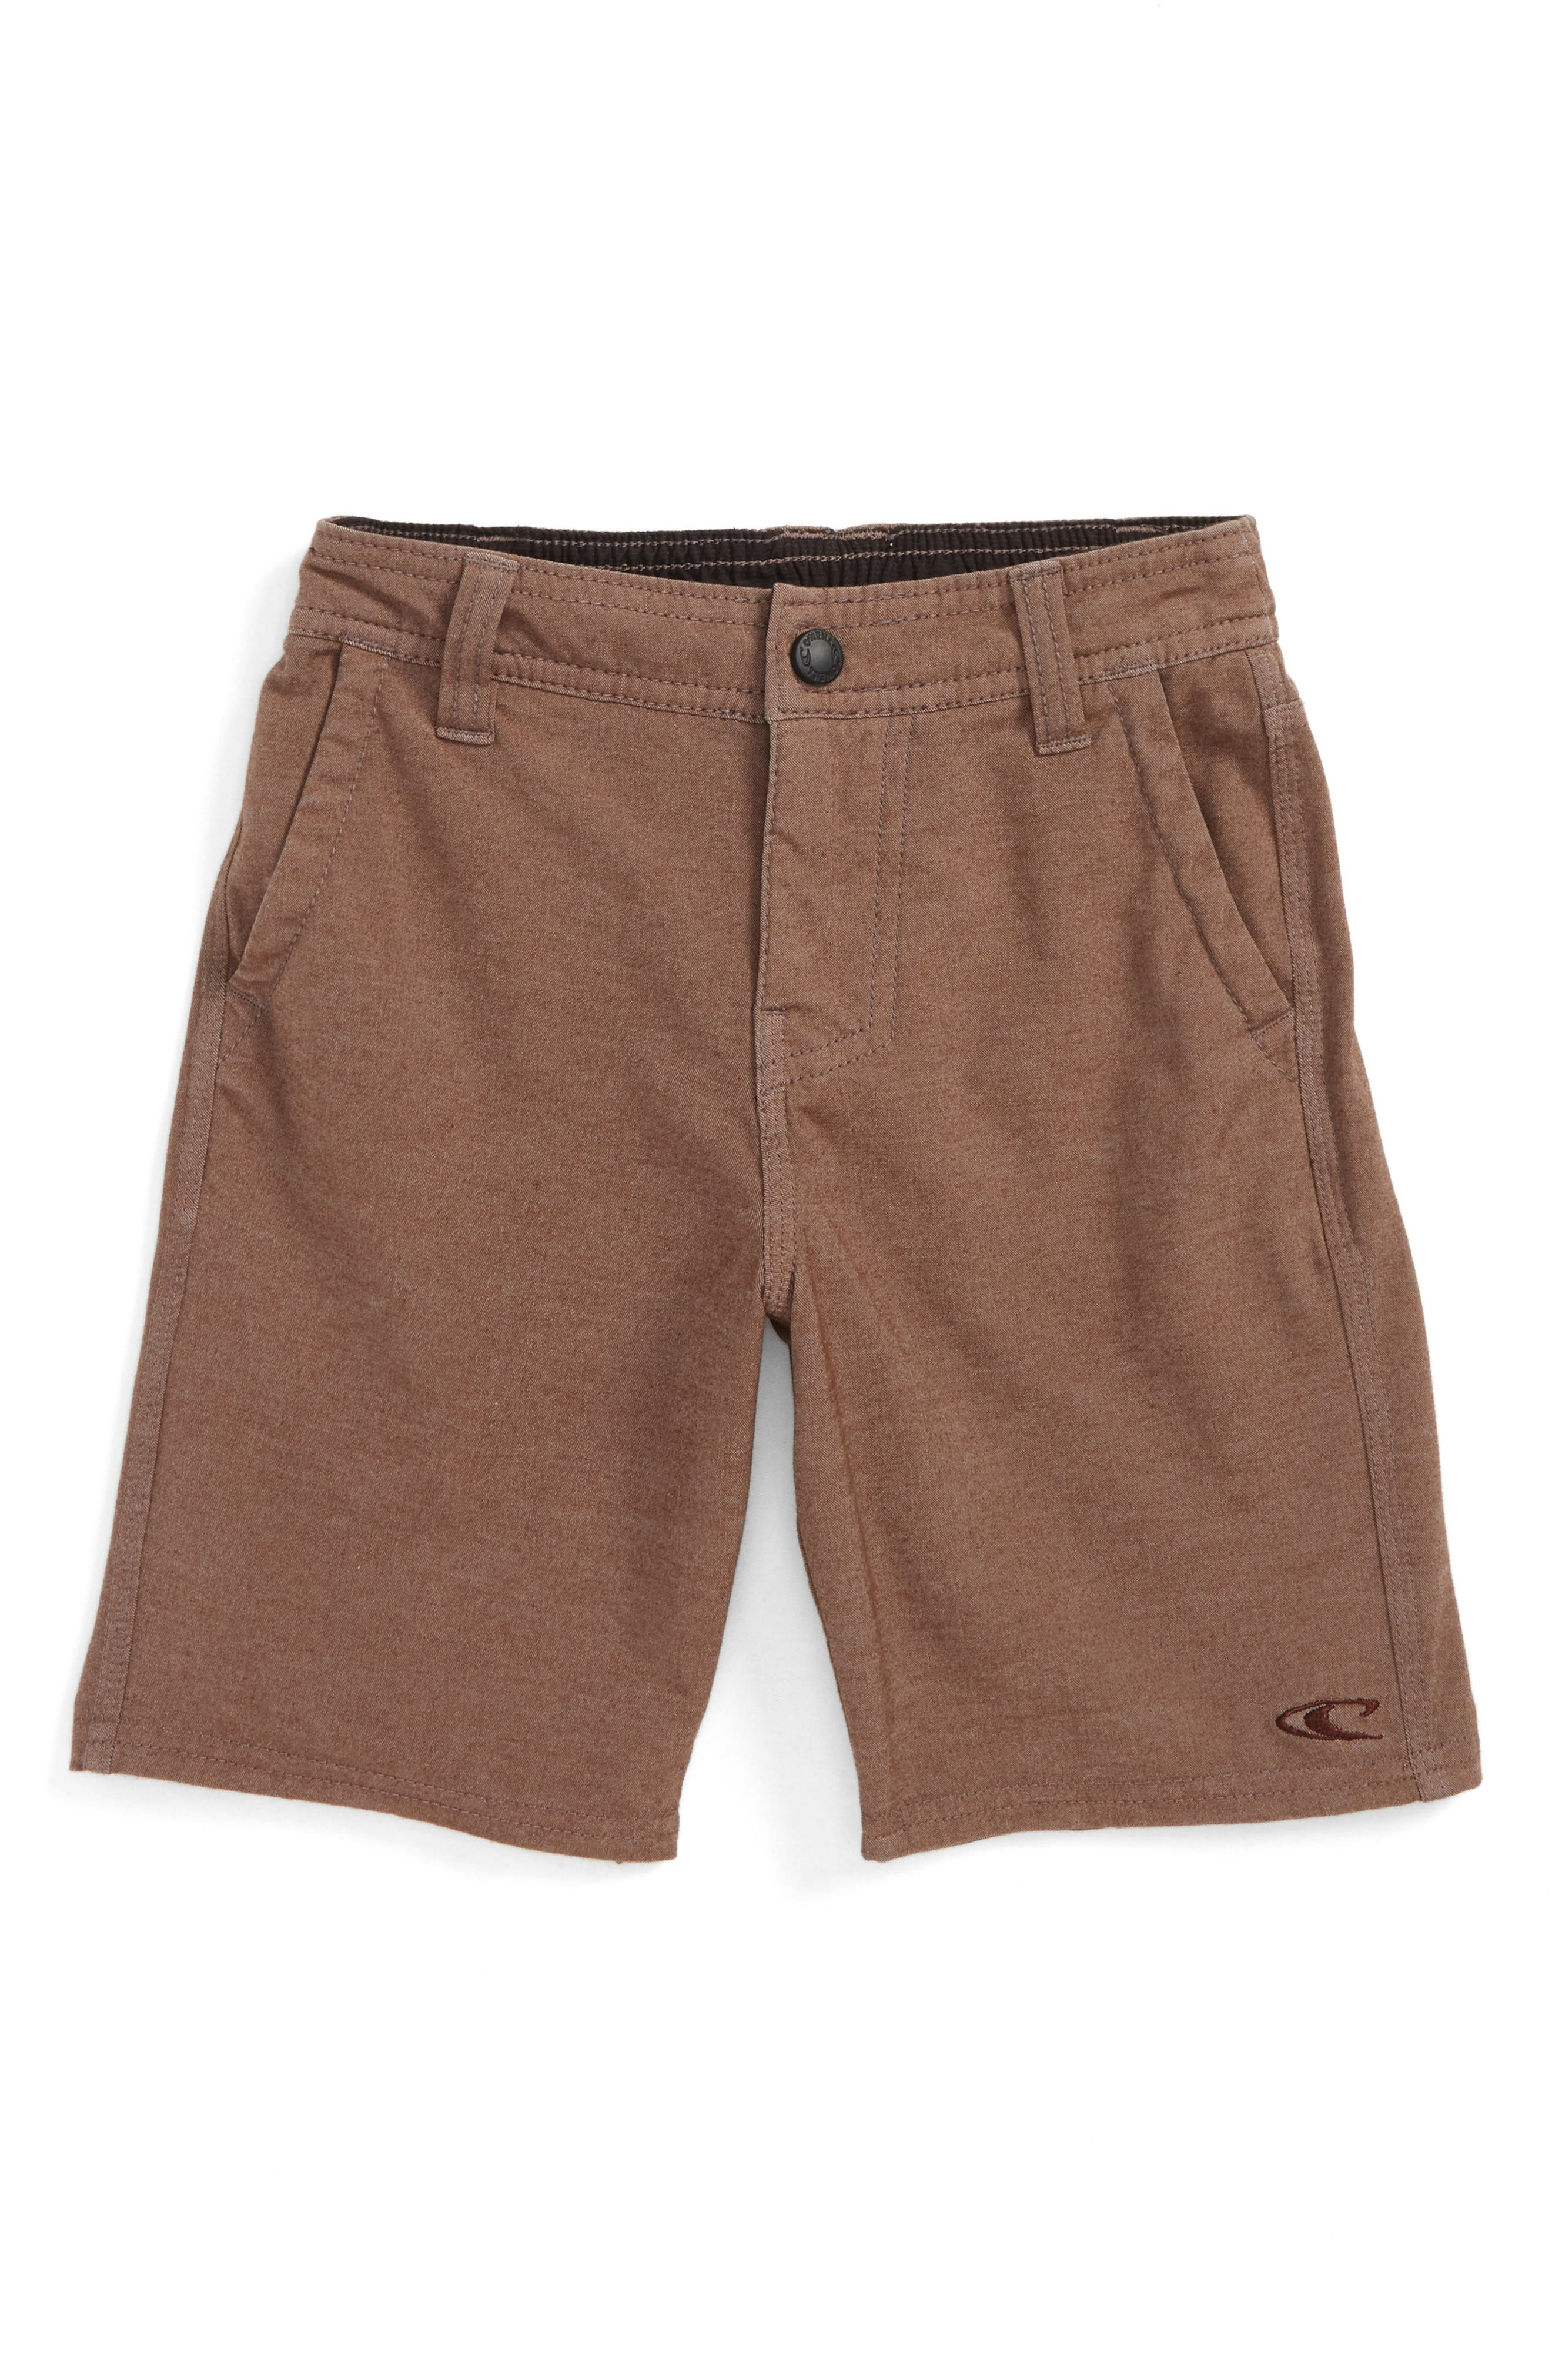 Locked Hybrid Board Shorts,                         Main,                         color, Coffee